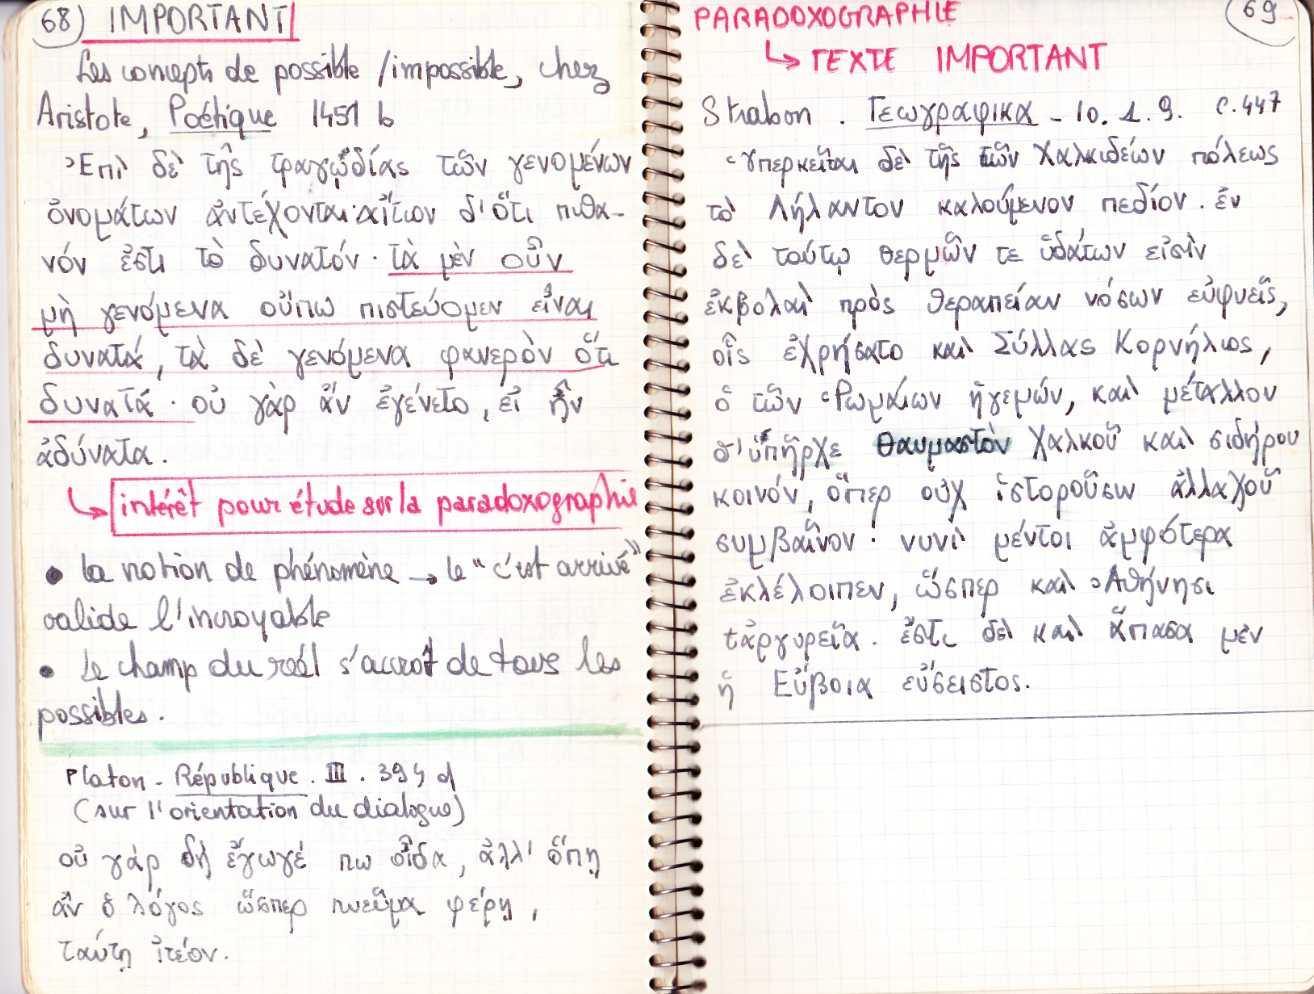 Archéologie du carnet de recherche (2) - Lieux de savoir